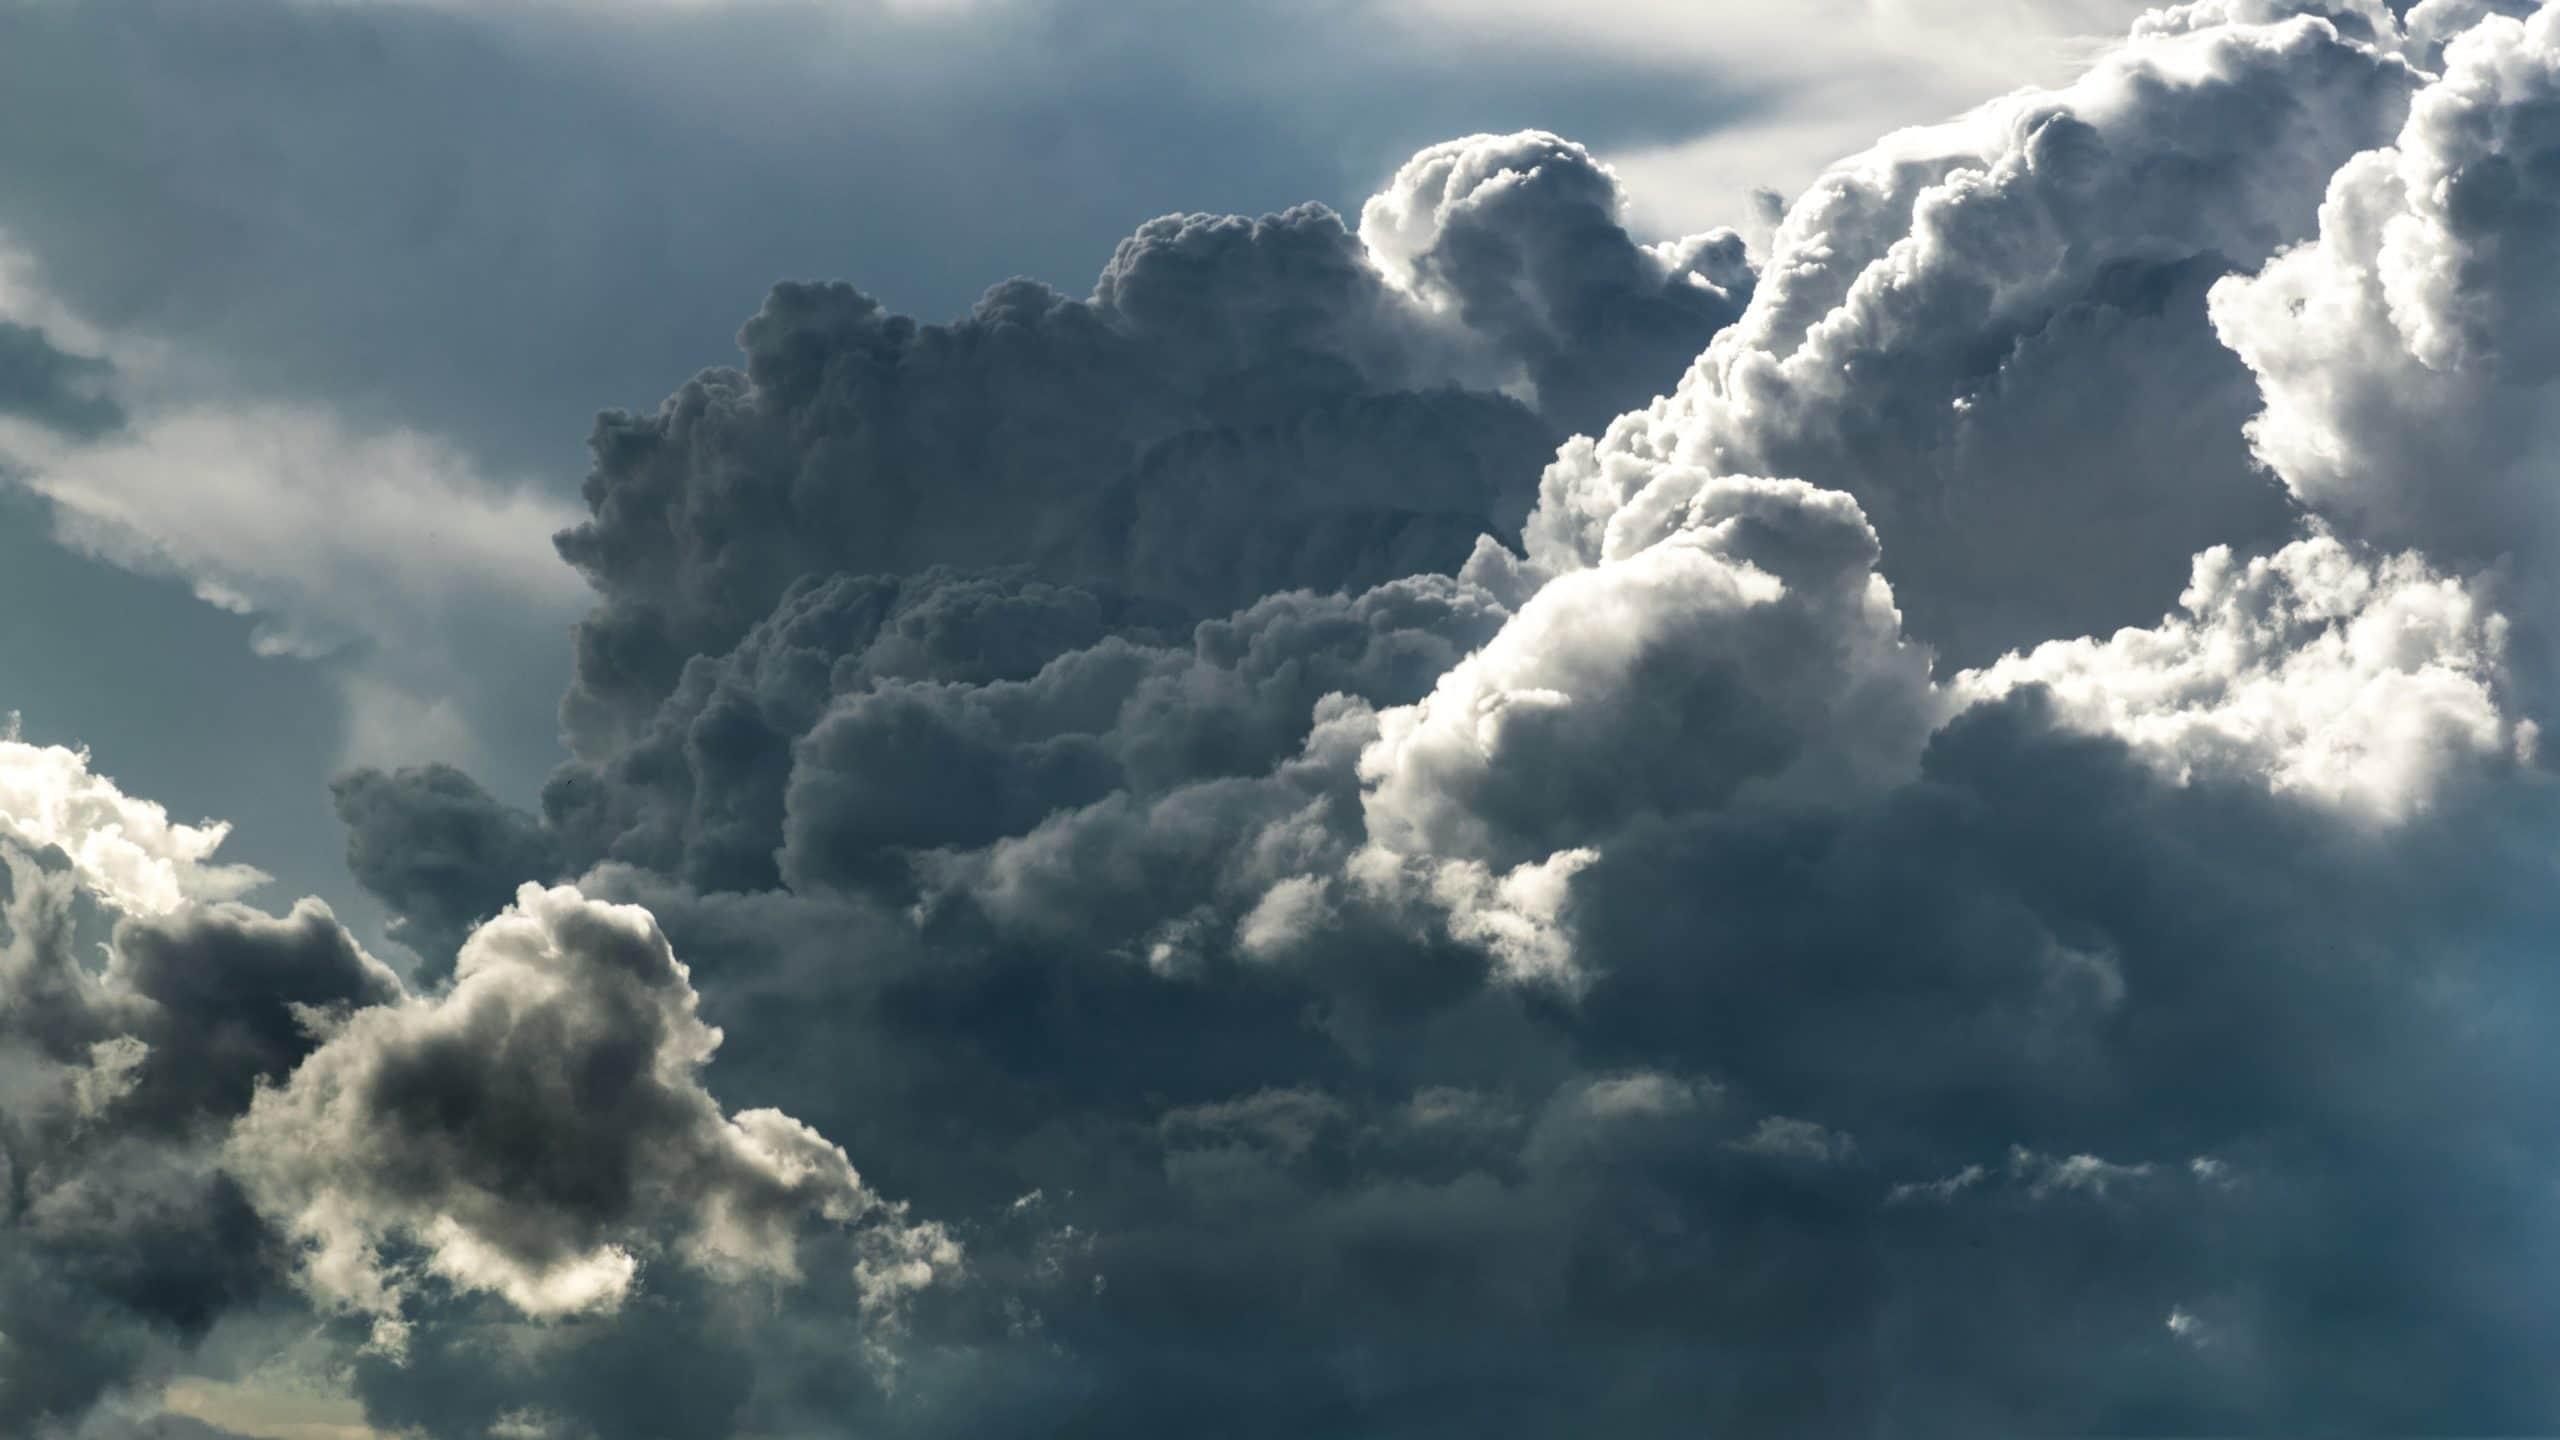 S/4HANA Public Cloud vs Private Cloud